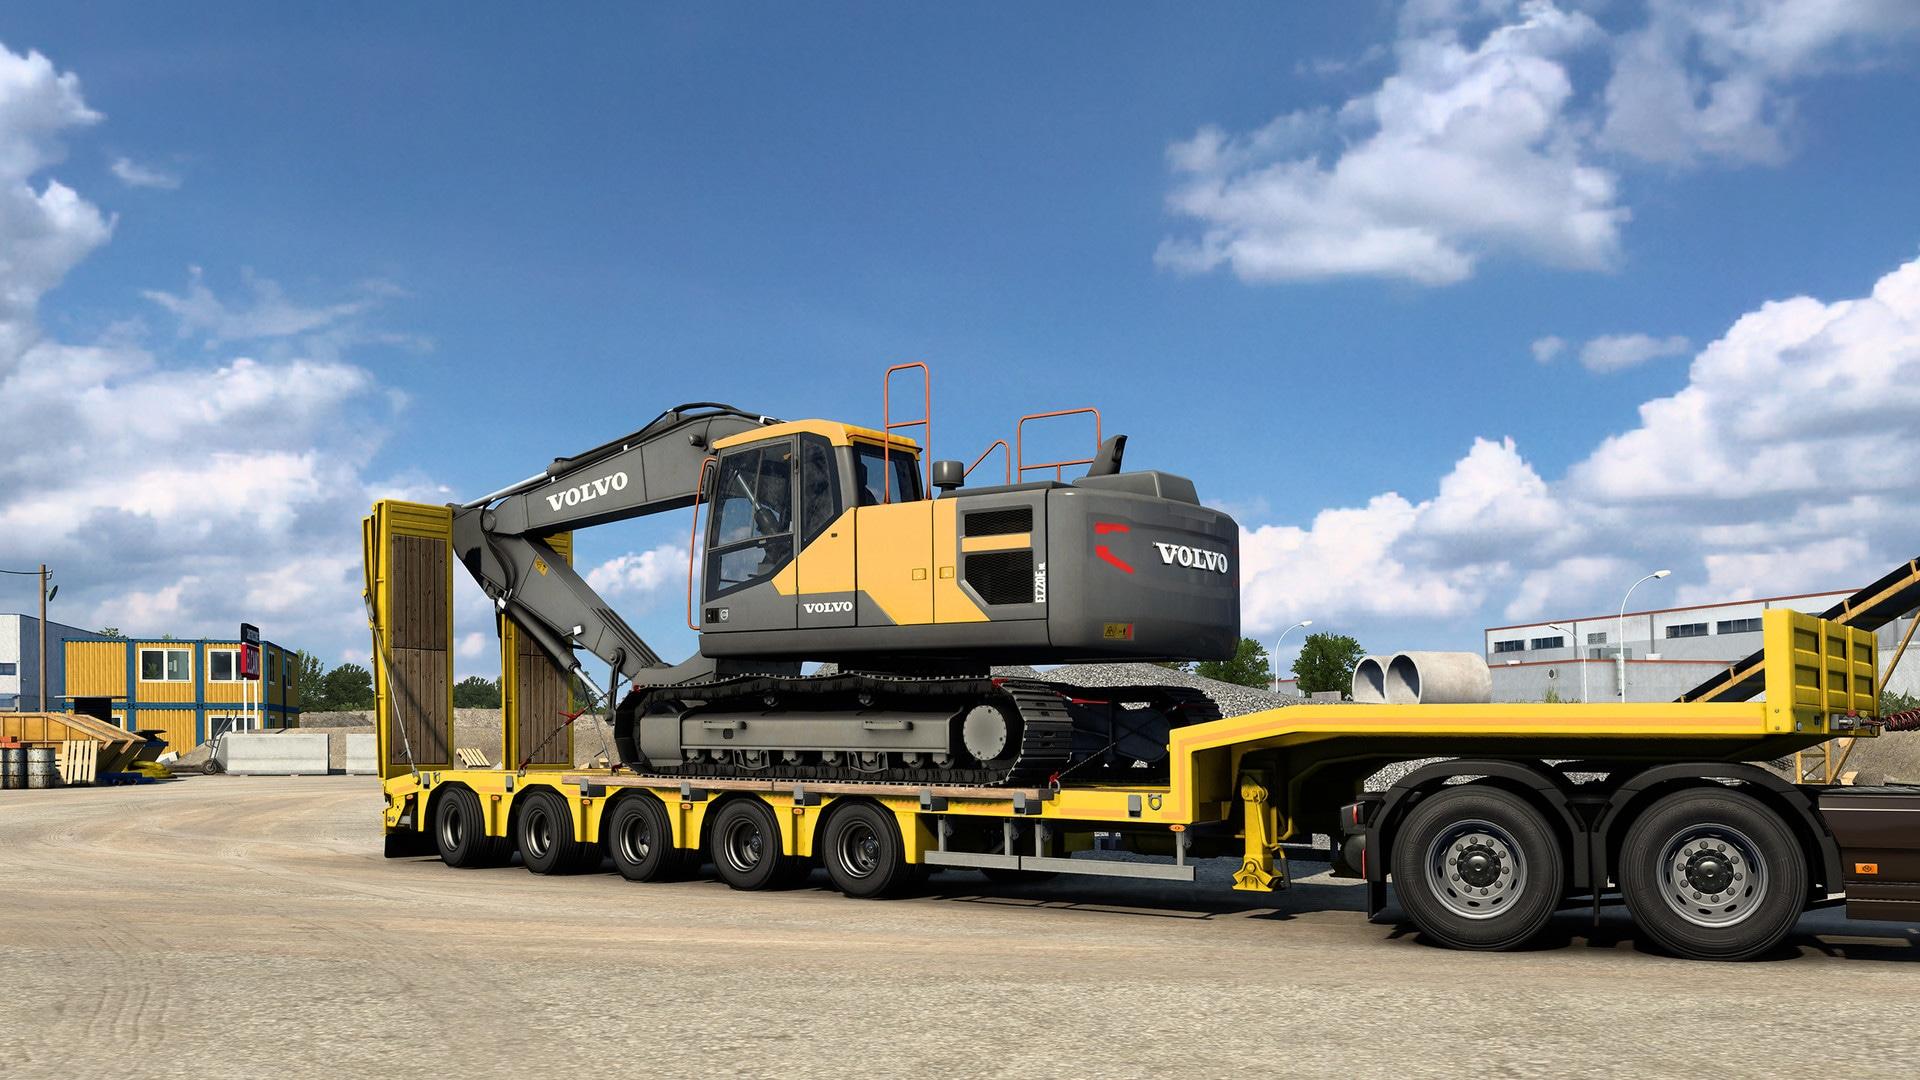 Euro Truck Simulator 2 - Volvo Construction Equipment (PC) - Steam Gift - EUROPE - 4